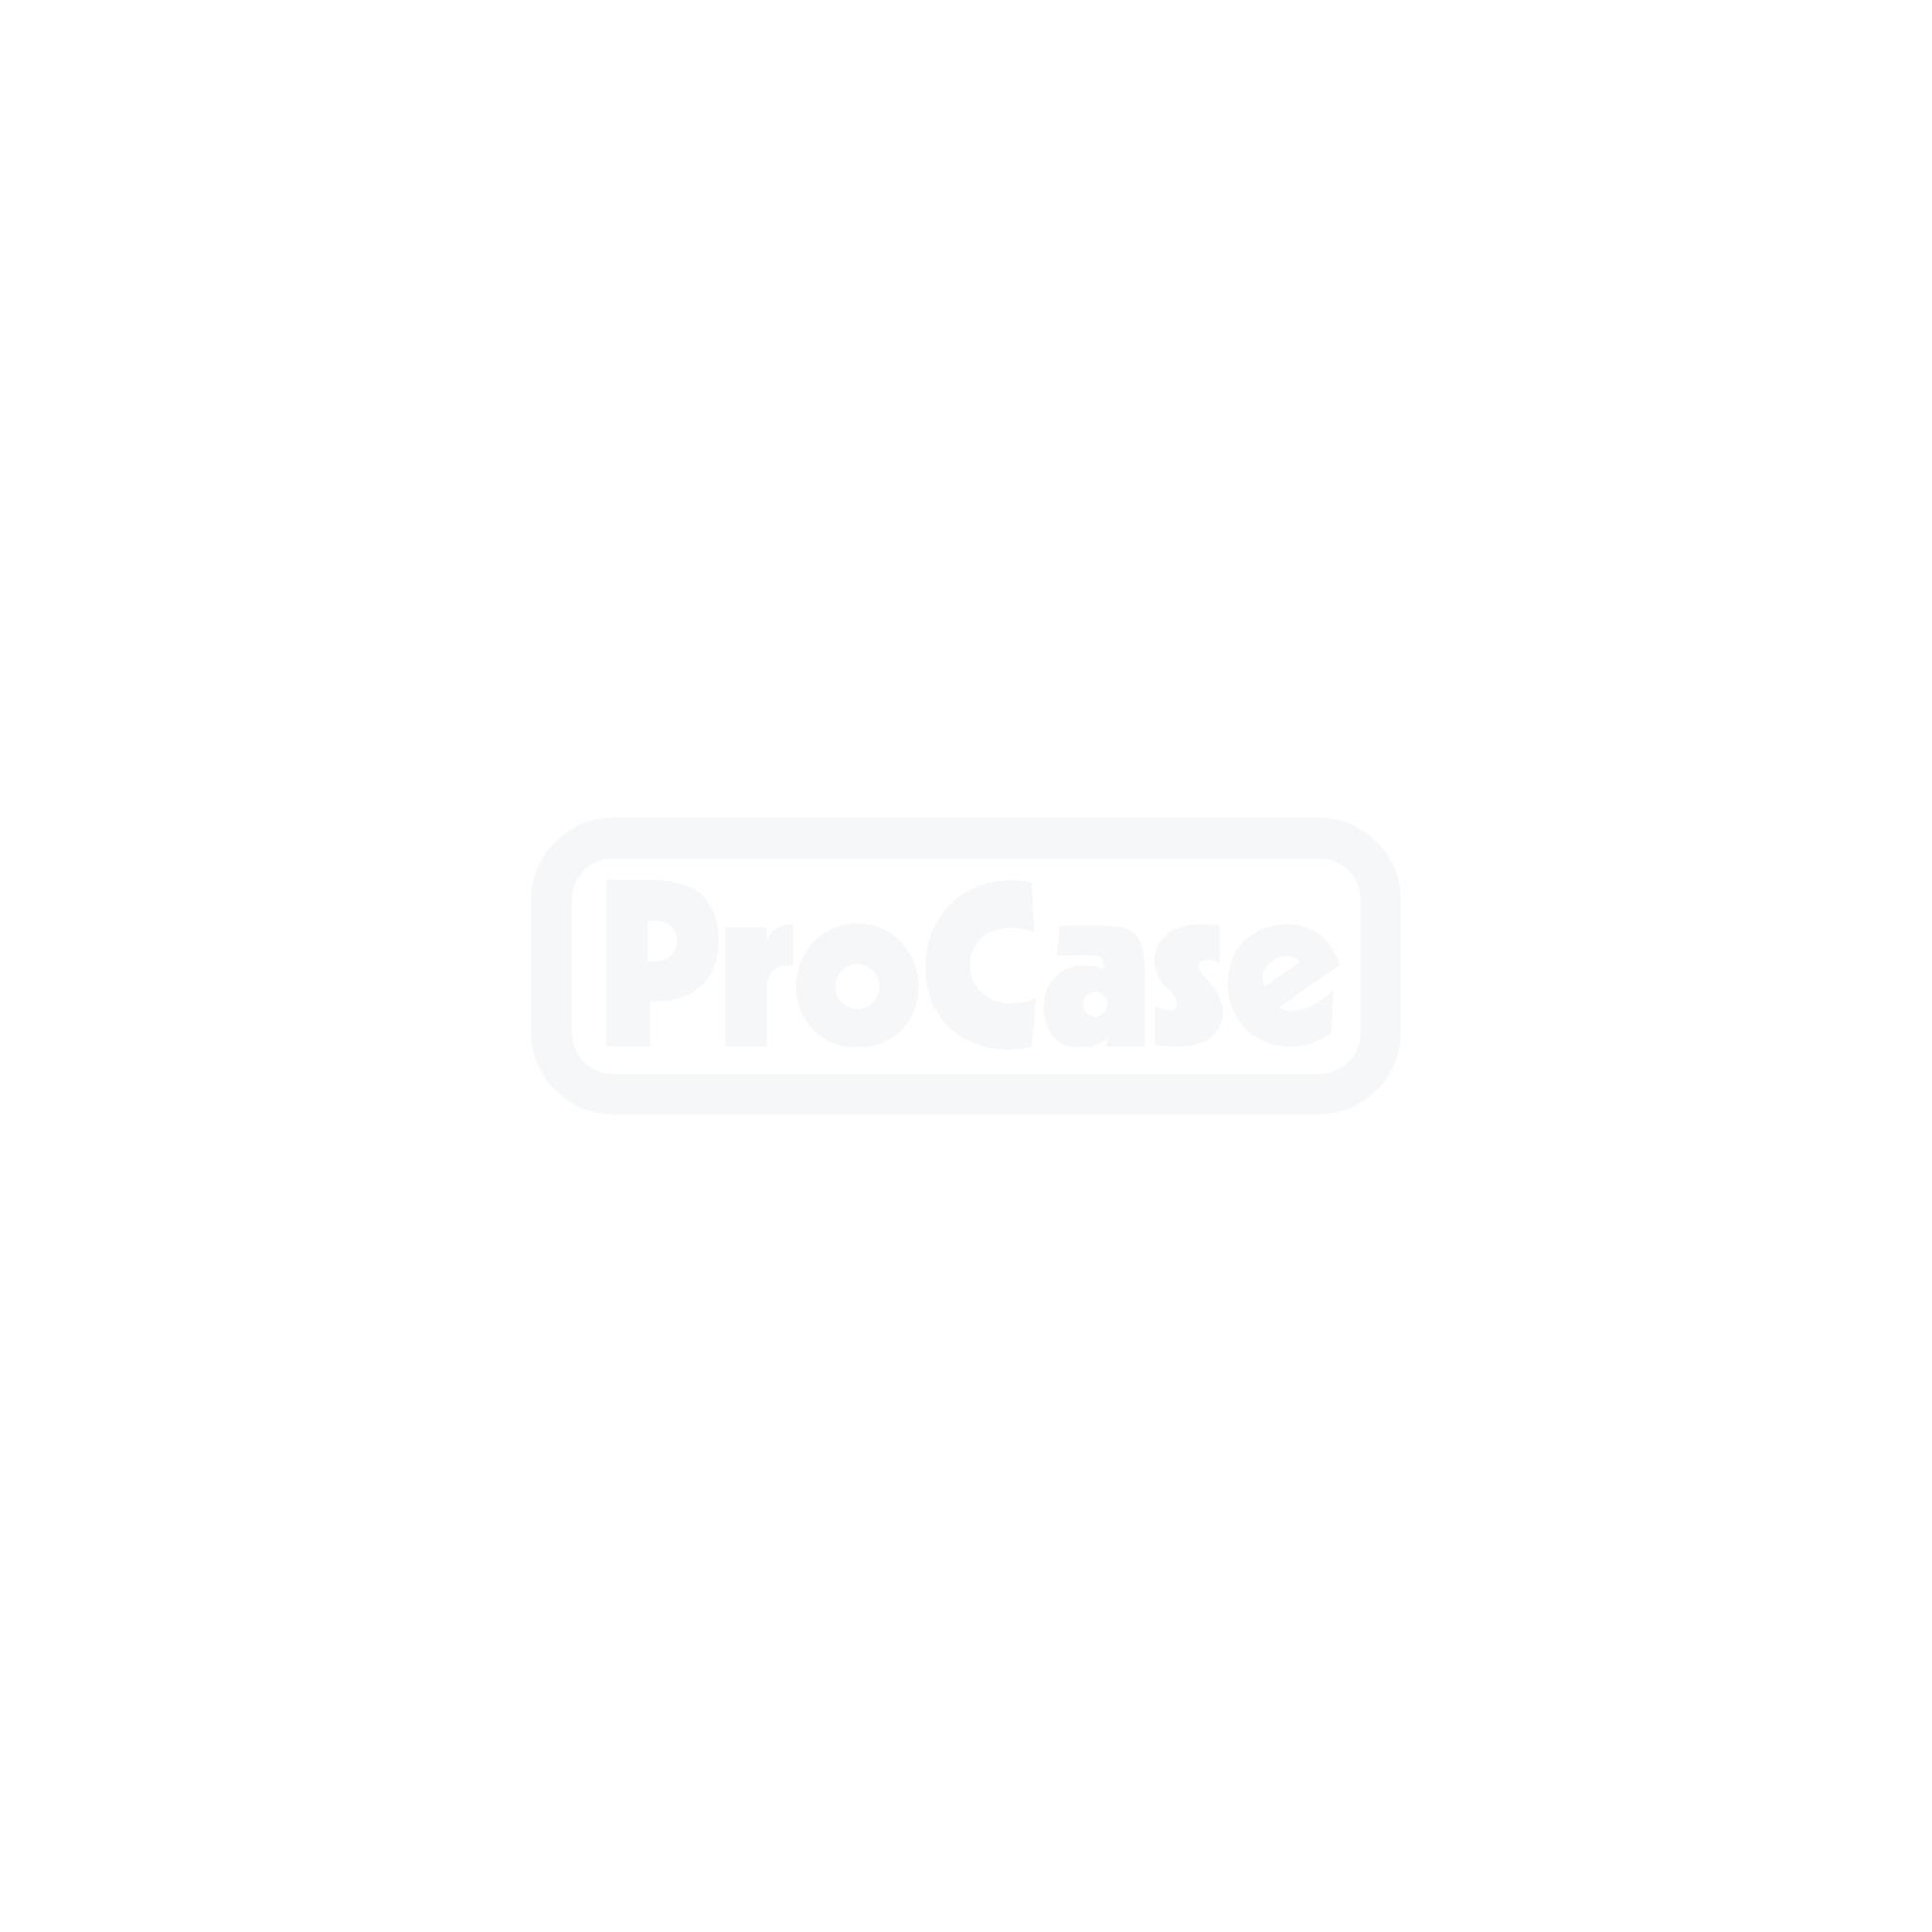 Stativ-Case / Hardware-Case 160